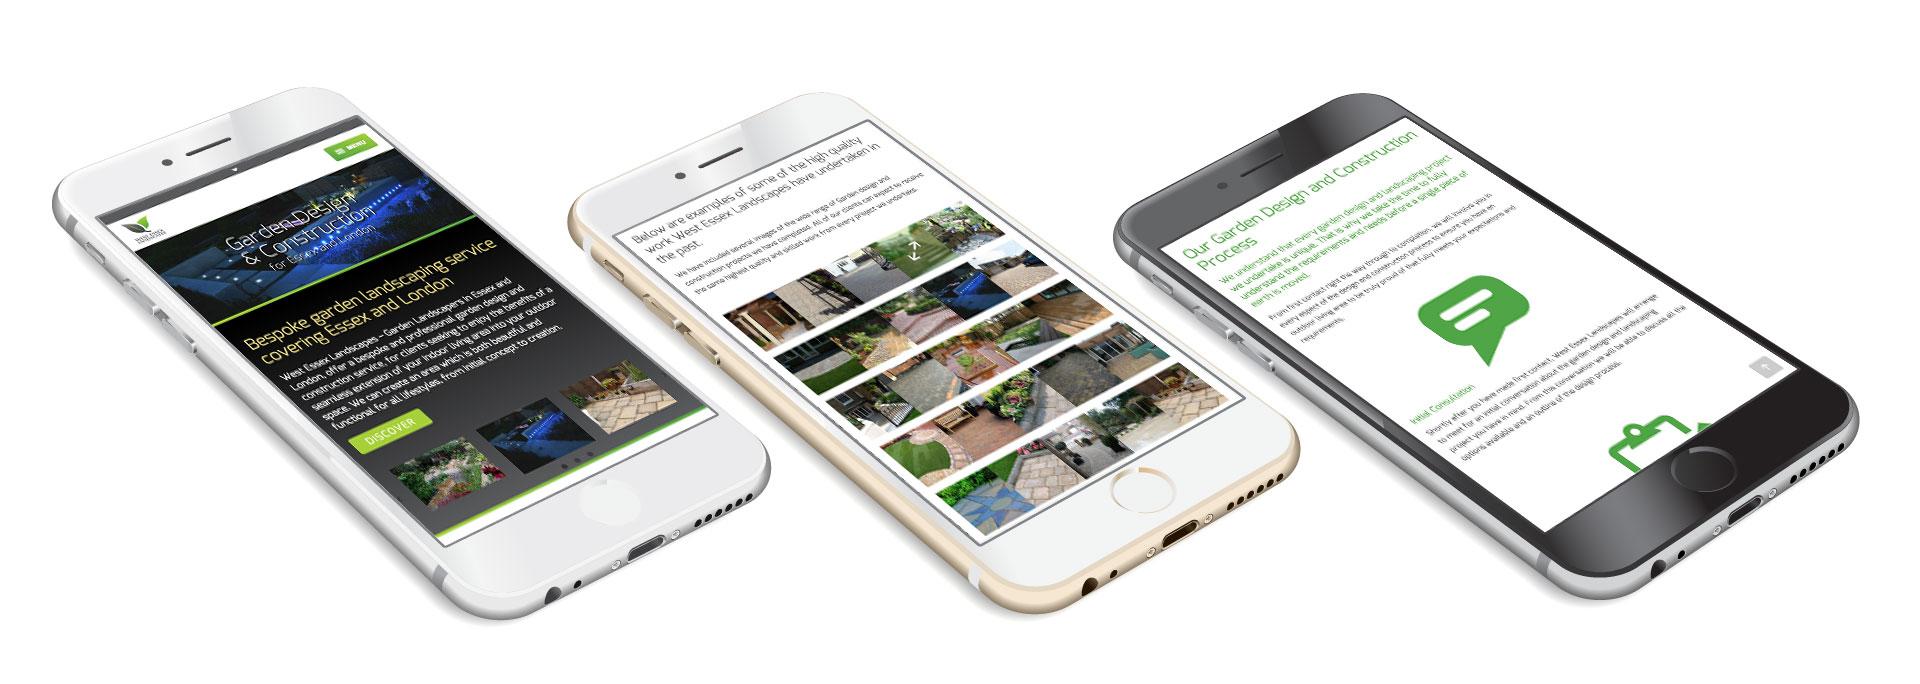 Responsive website on iPhone